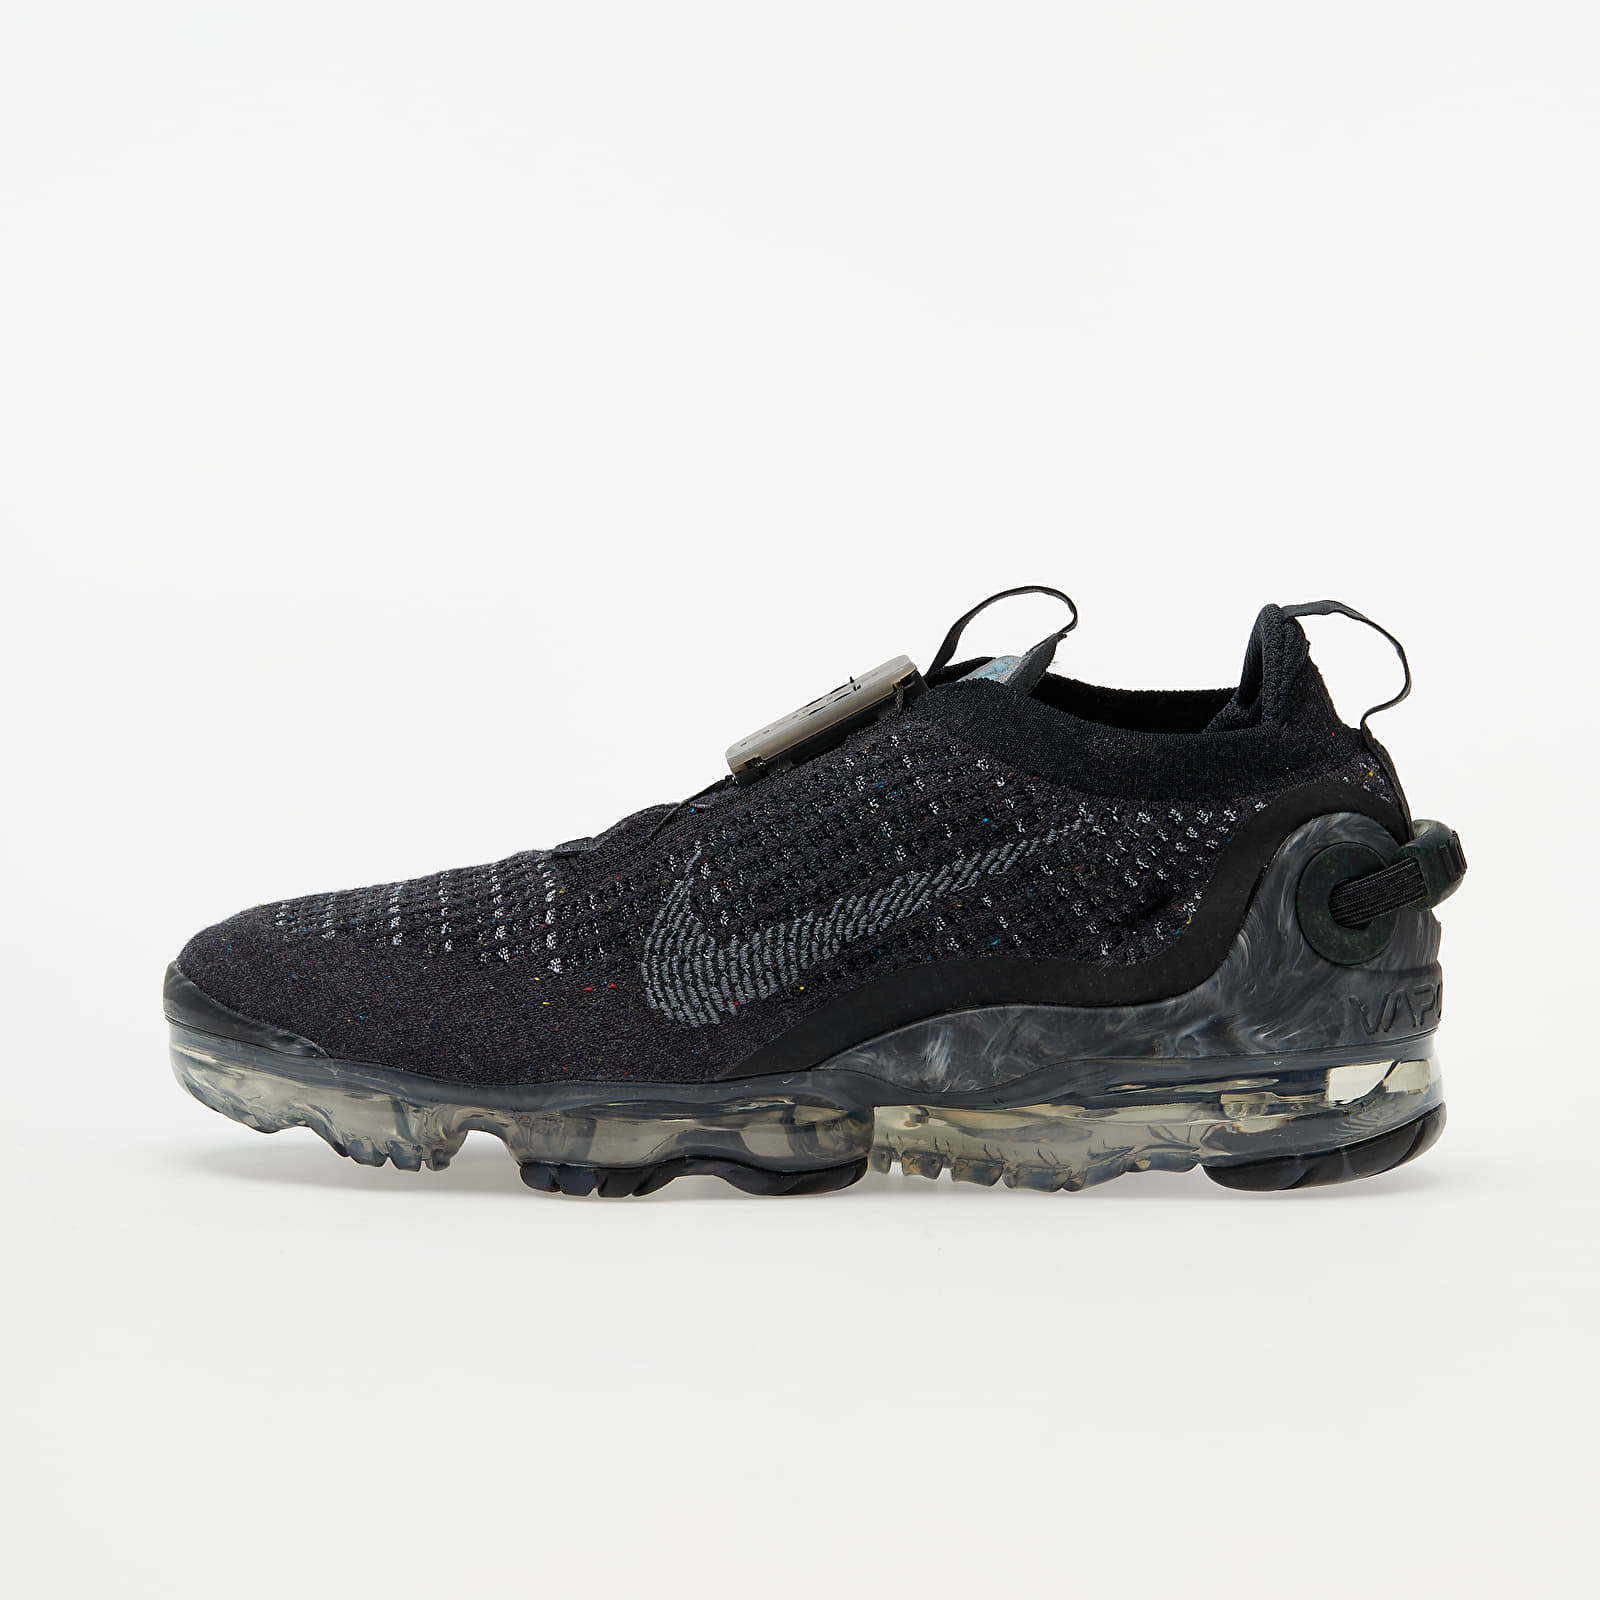 Pánské tenisky a boty Nike Air Vapormax 2020 FK Black/ Dark Grey-Black